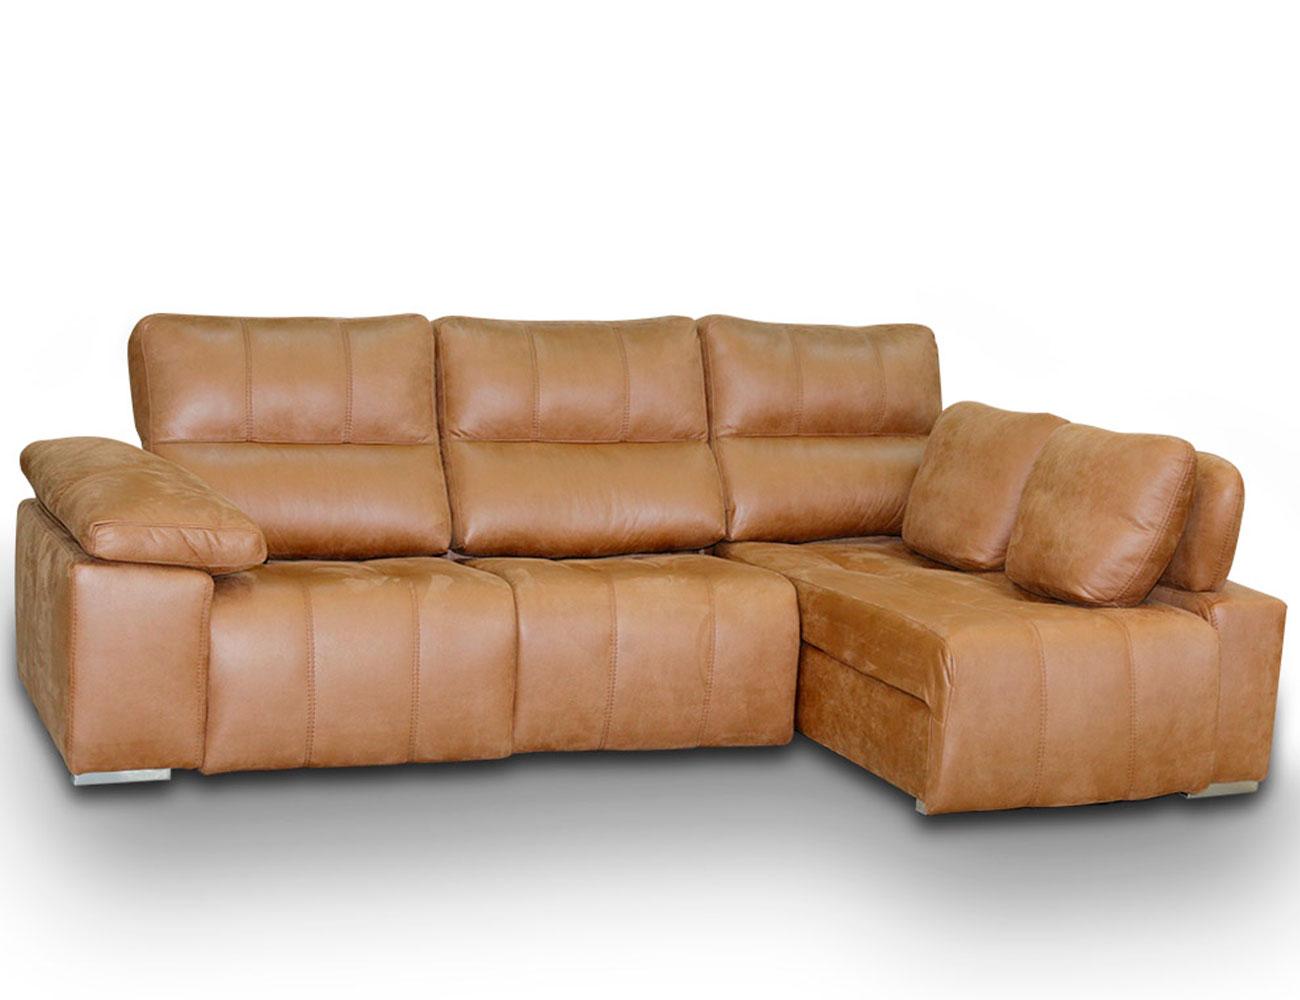 Sofa chaiselongue relax 2 motores anti manchas31